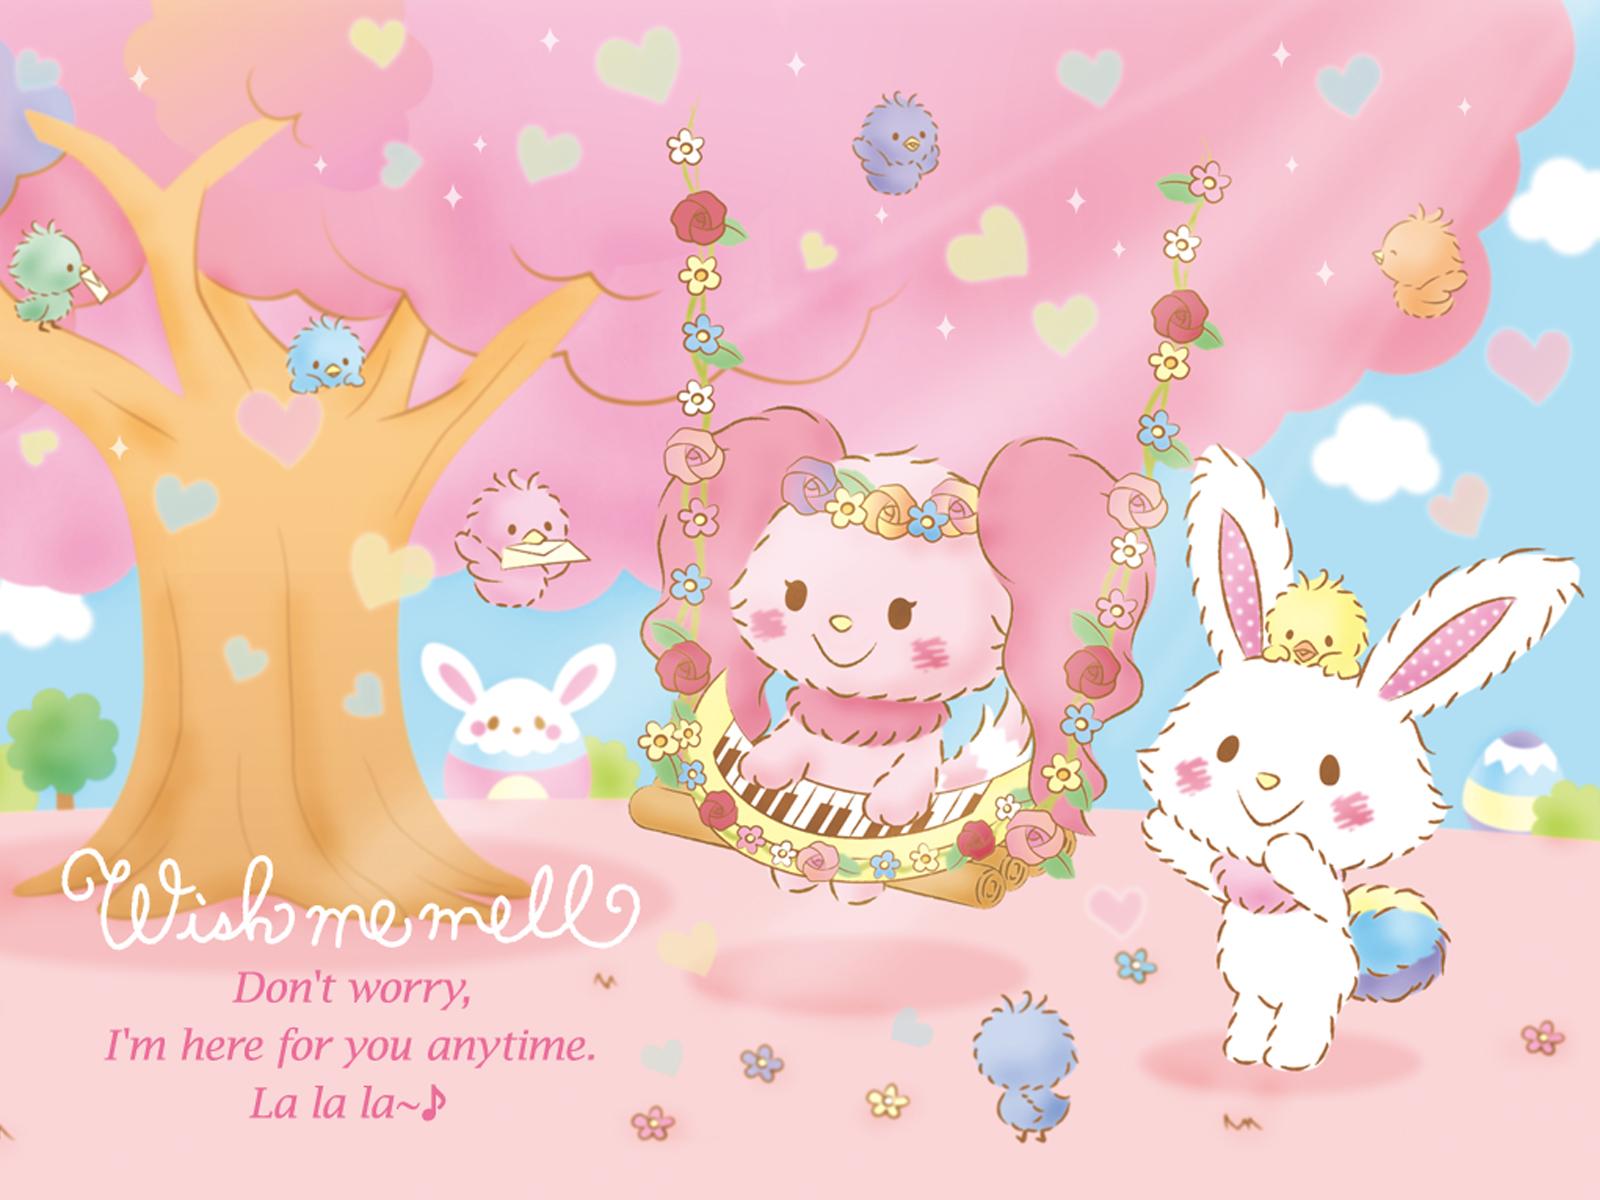 cute kitten live wallpaper